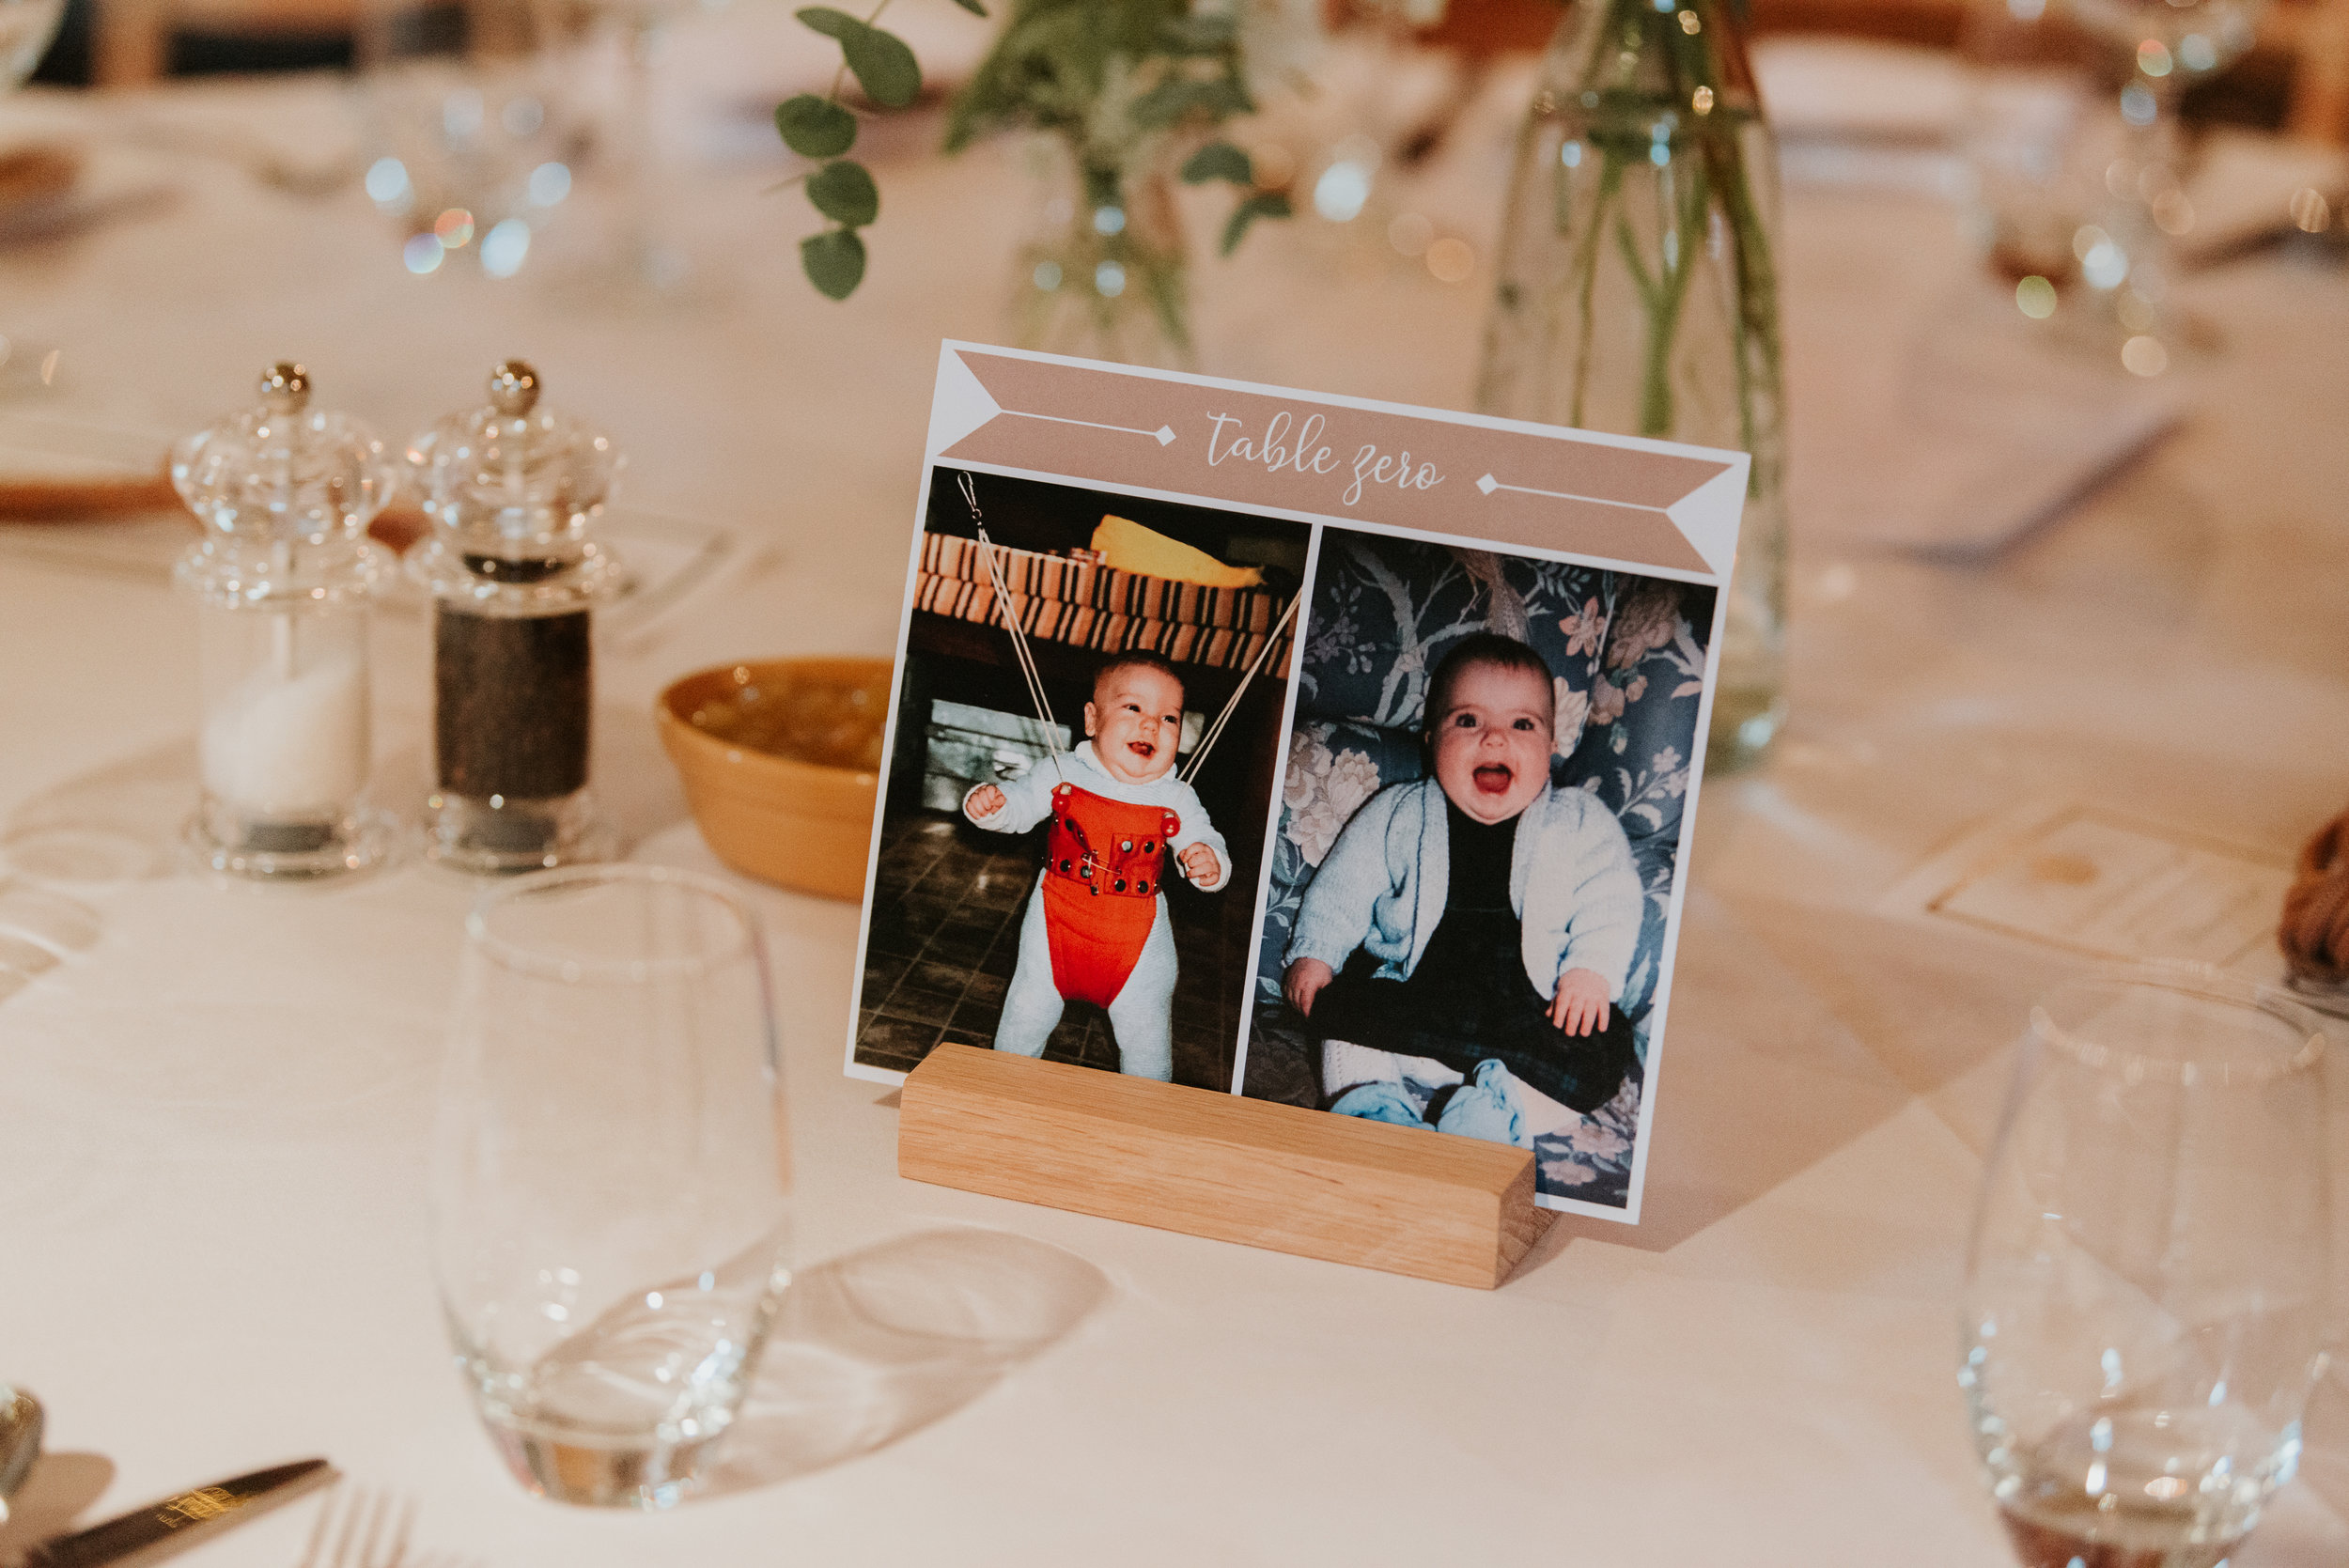 wedding table names with photos